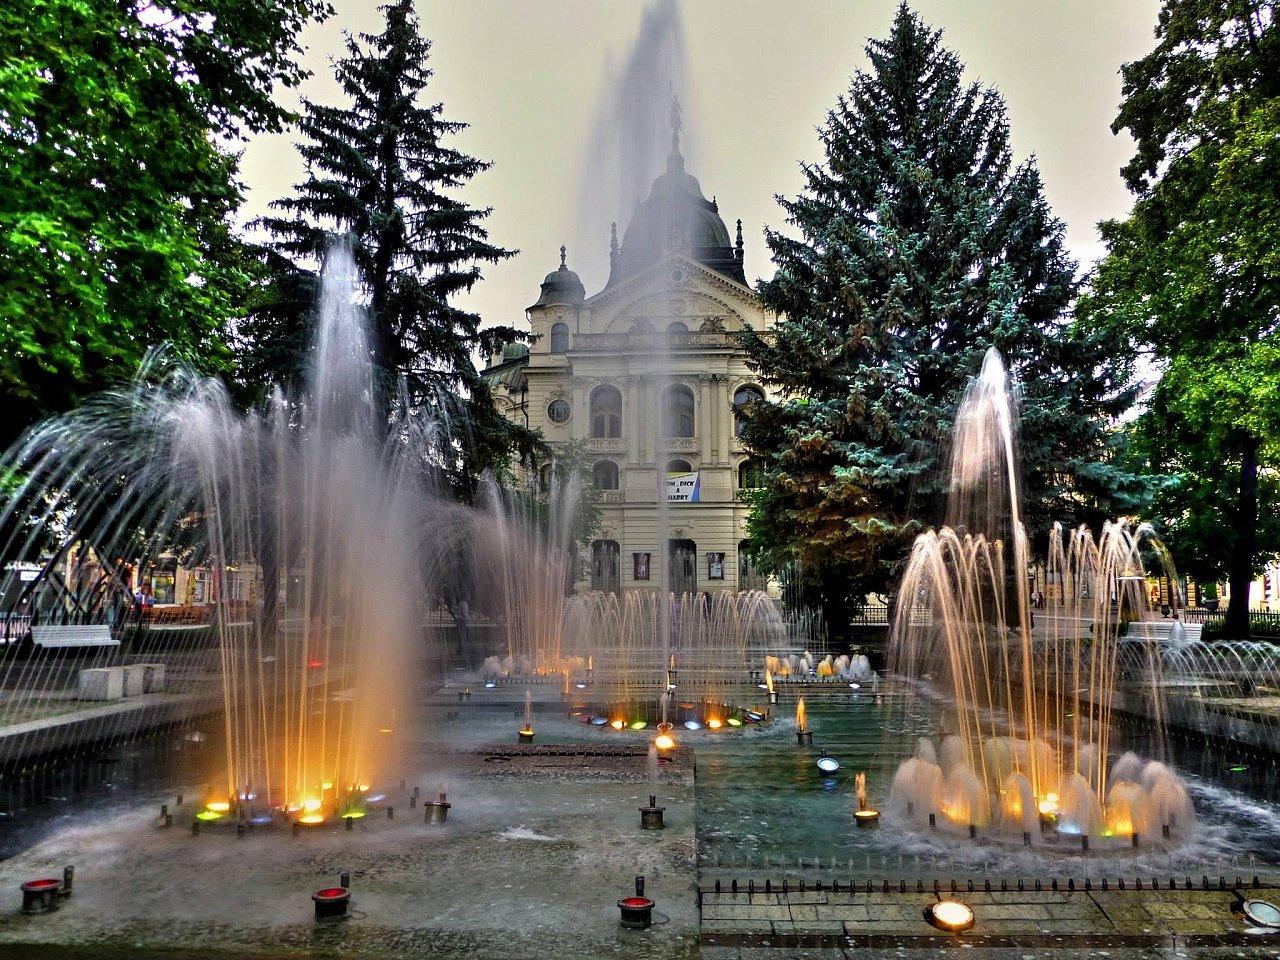 Singing fountain in Kosice, Slovakia